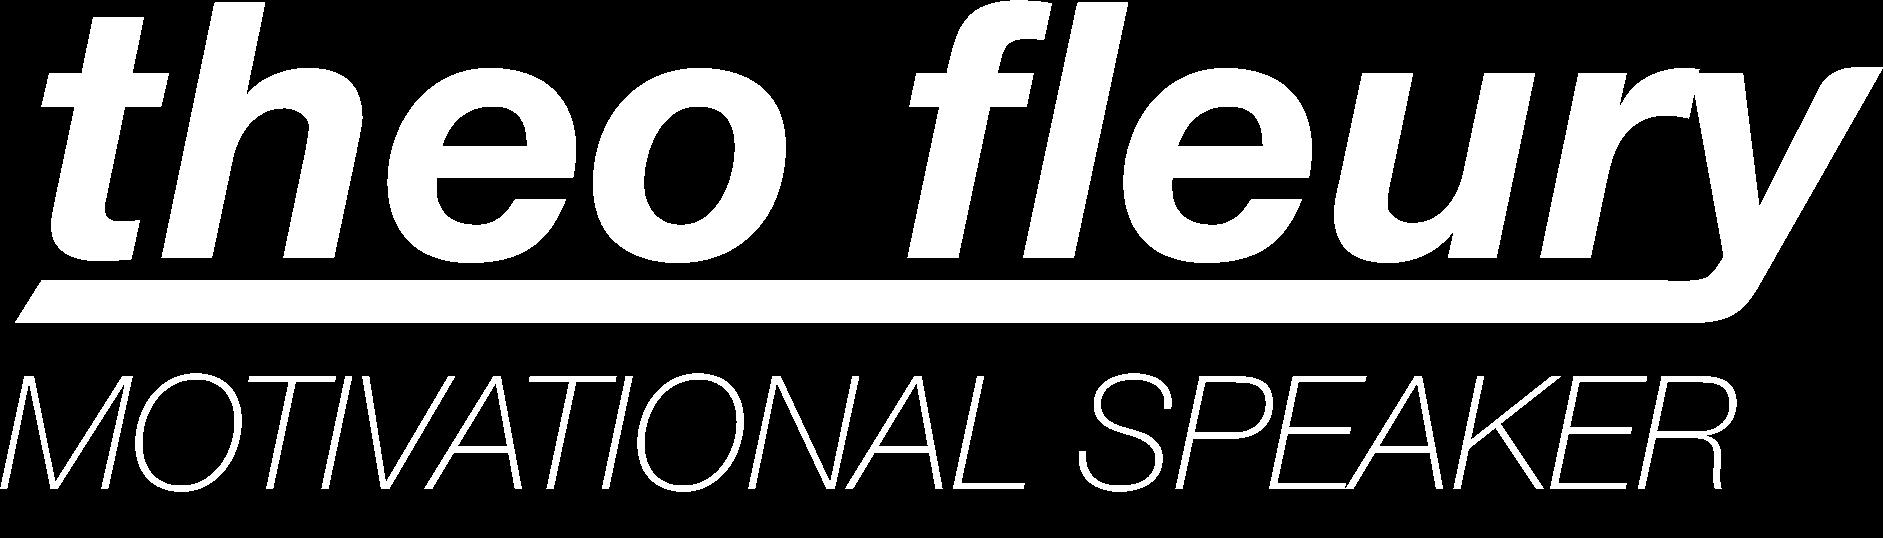 Theo fluery logo